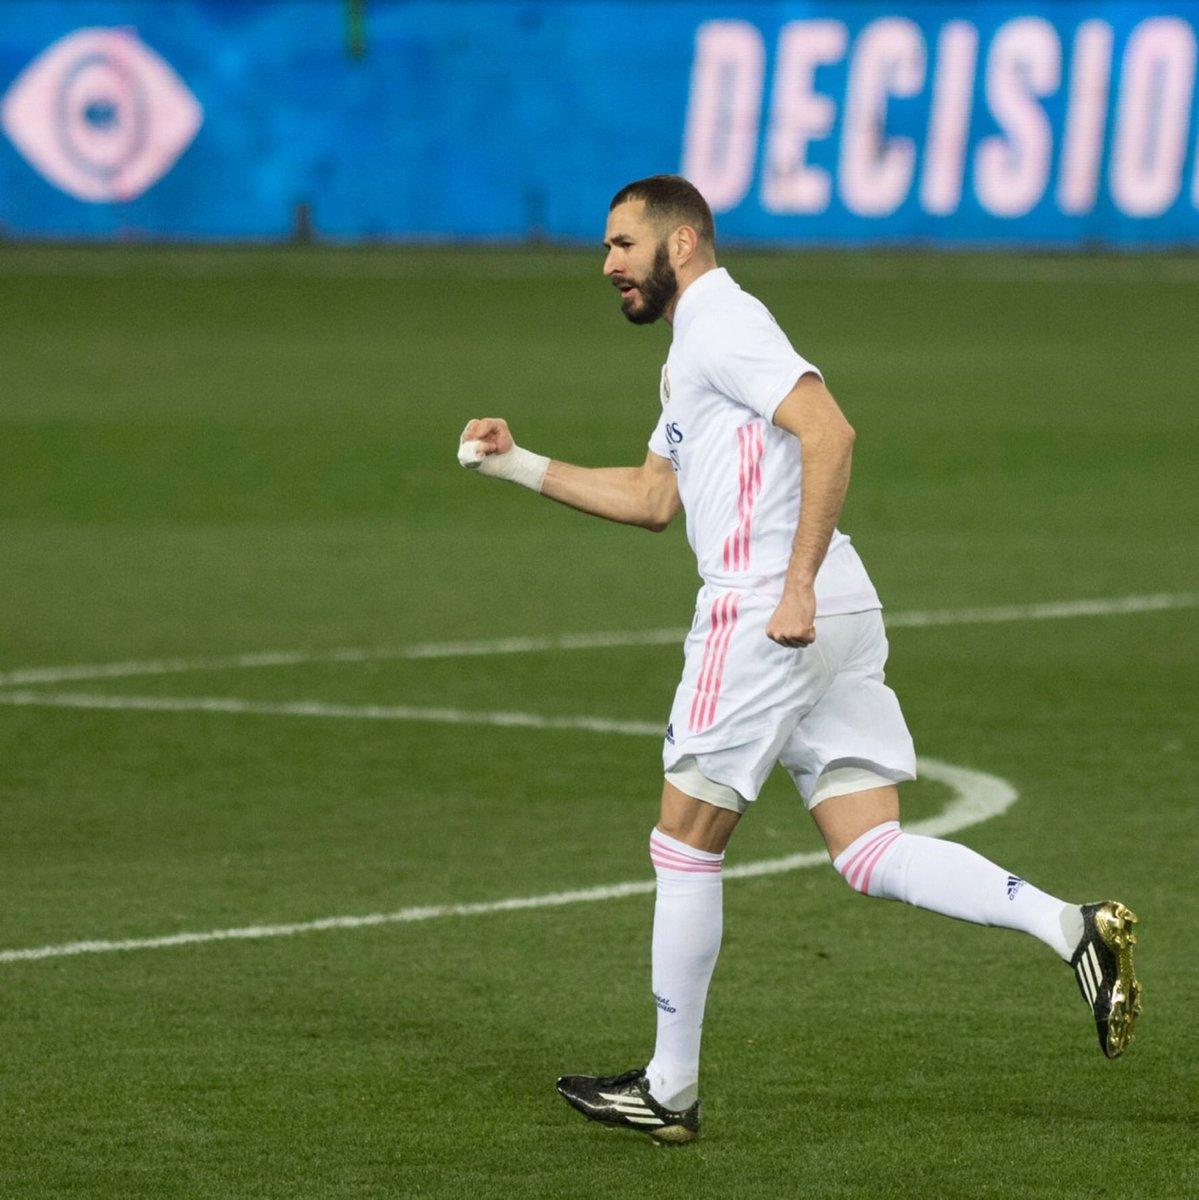 🔵Alaves 0 | 2 Real Madrid⚪️ Golazo ⚽️ de Benzema , por la escuadra! 👏 #RMLiga #AlavesRealMadrid  #RMFans #realfootball #HalaMadrid